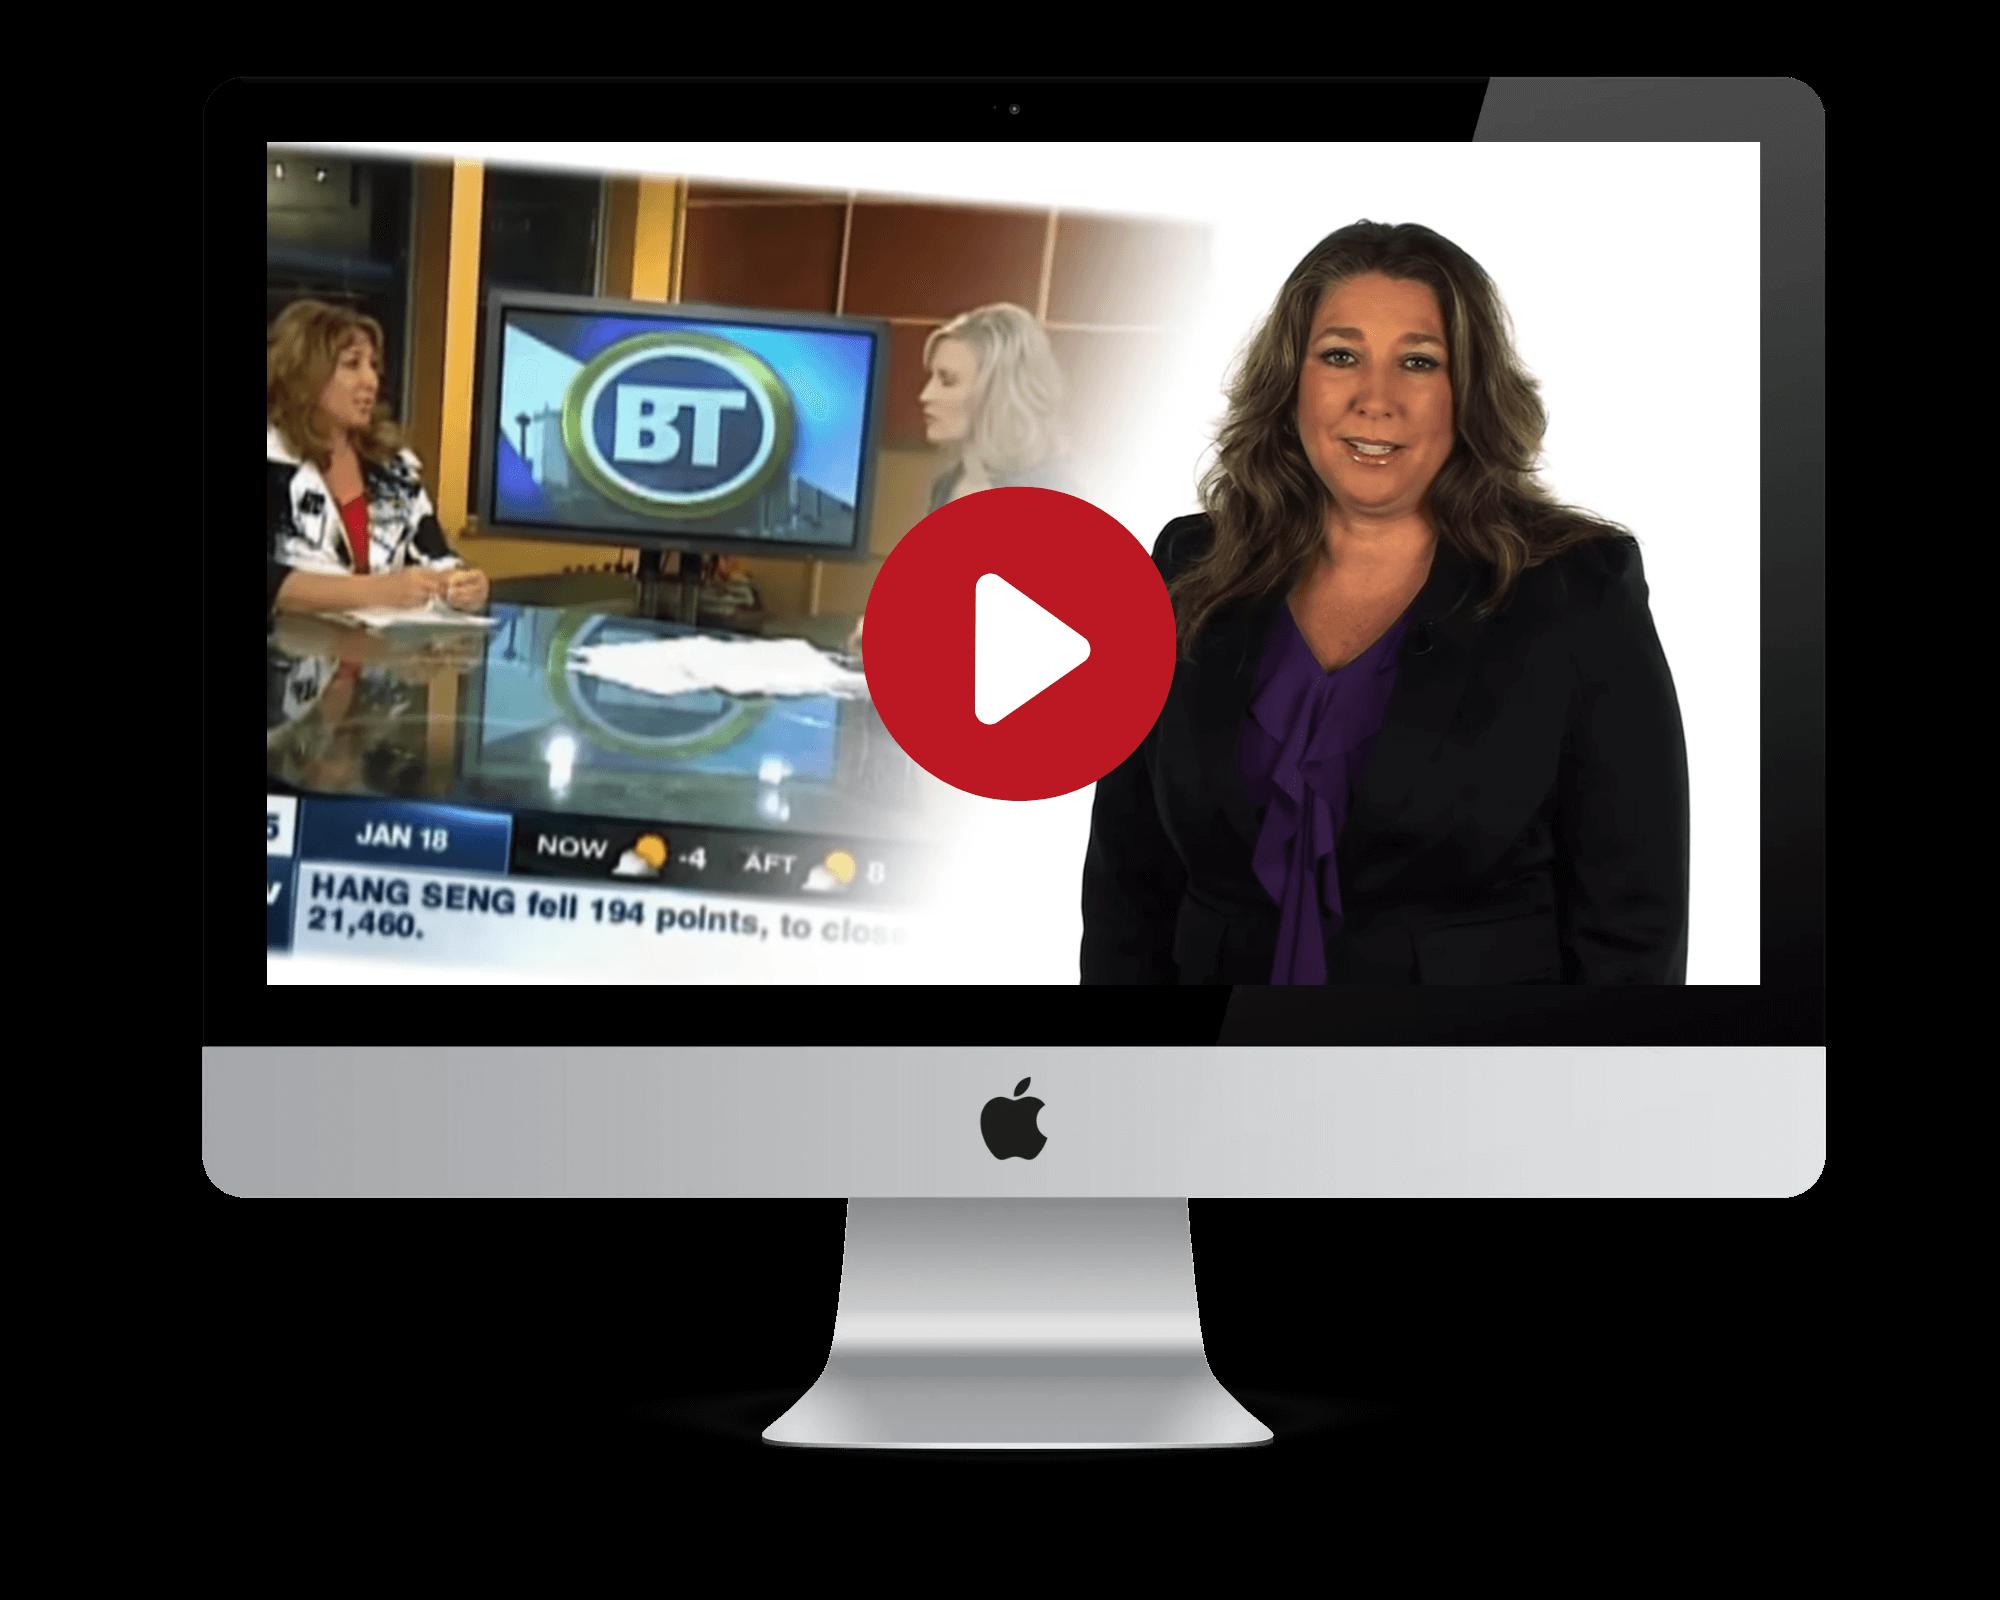 Video image of Sharlene Massie